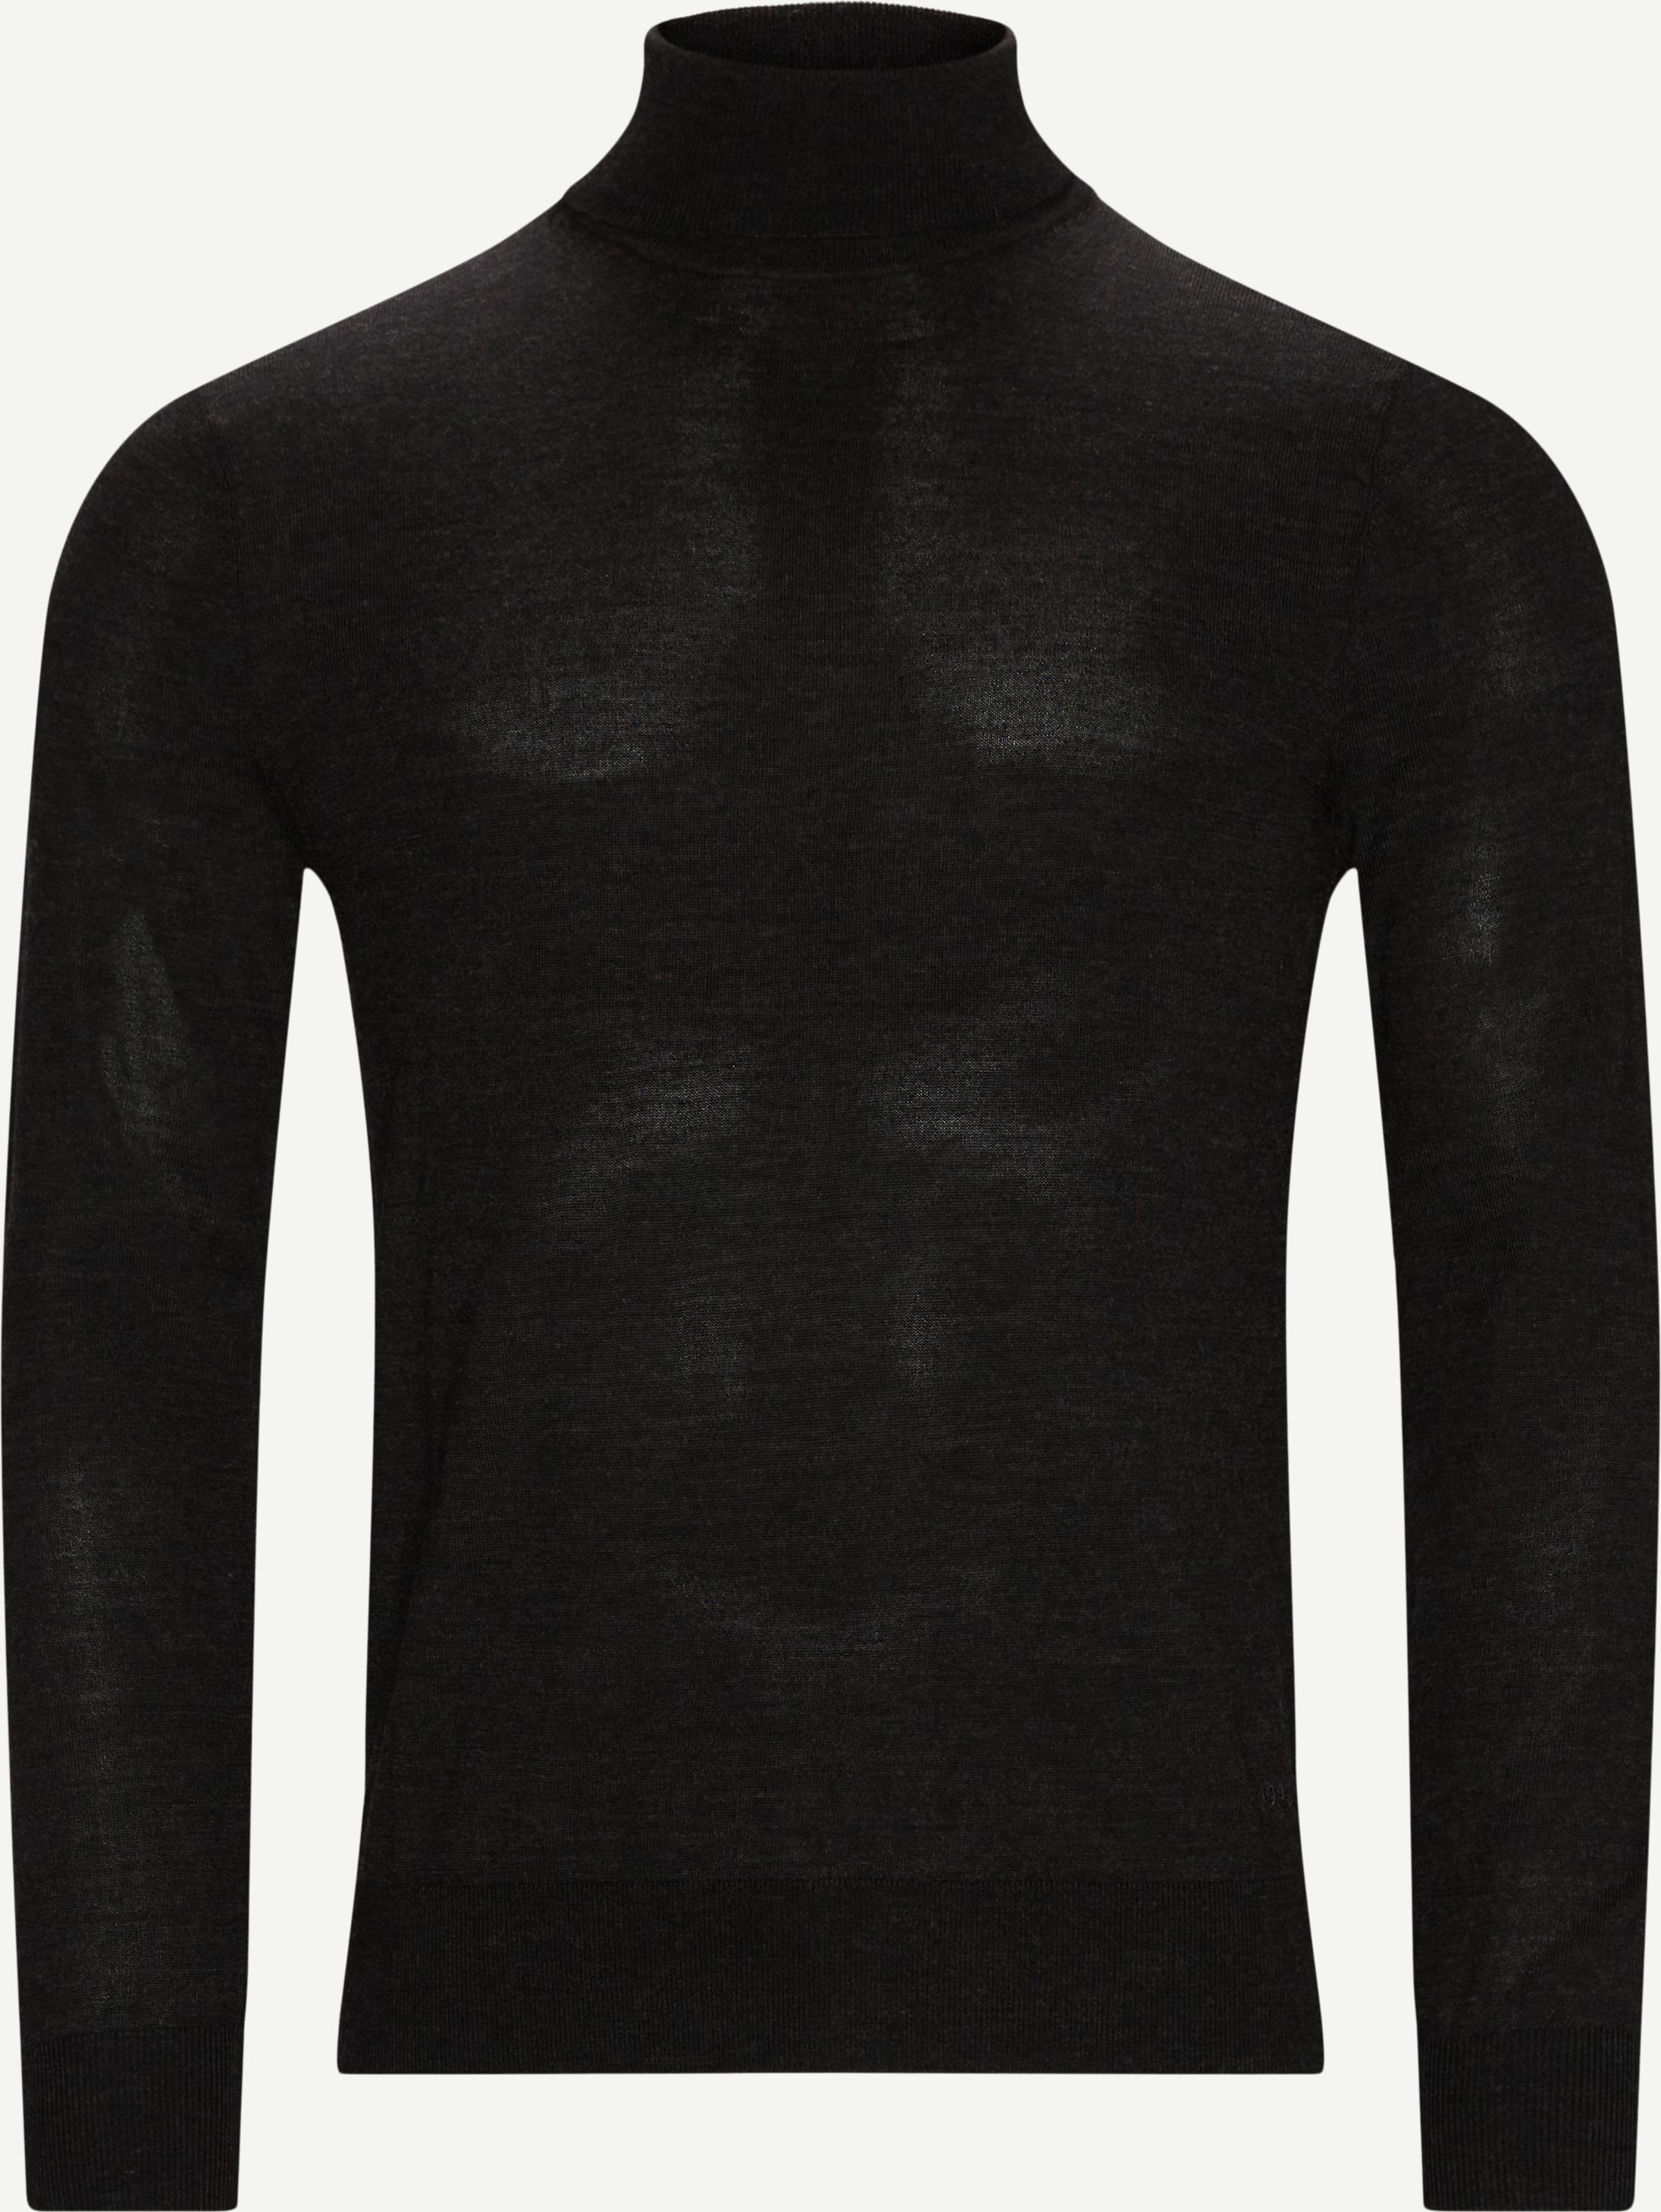 Knitwear - Slim fit - Grey